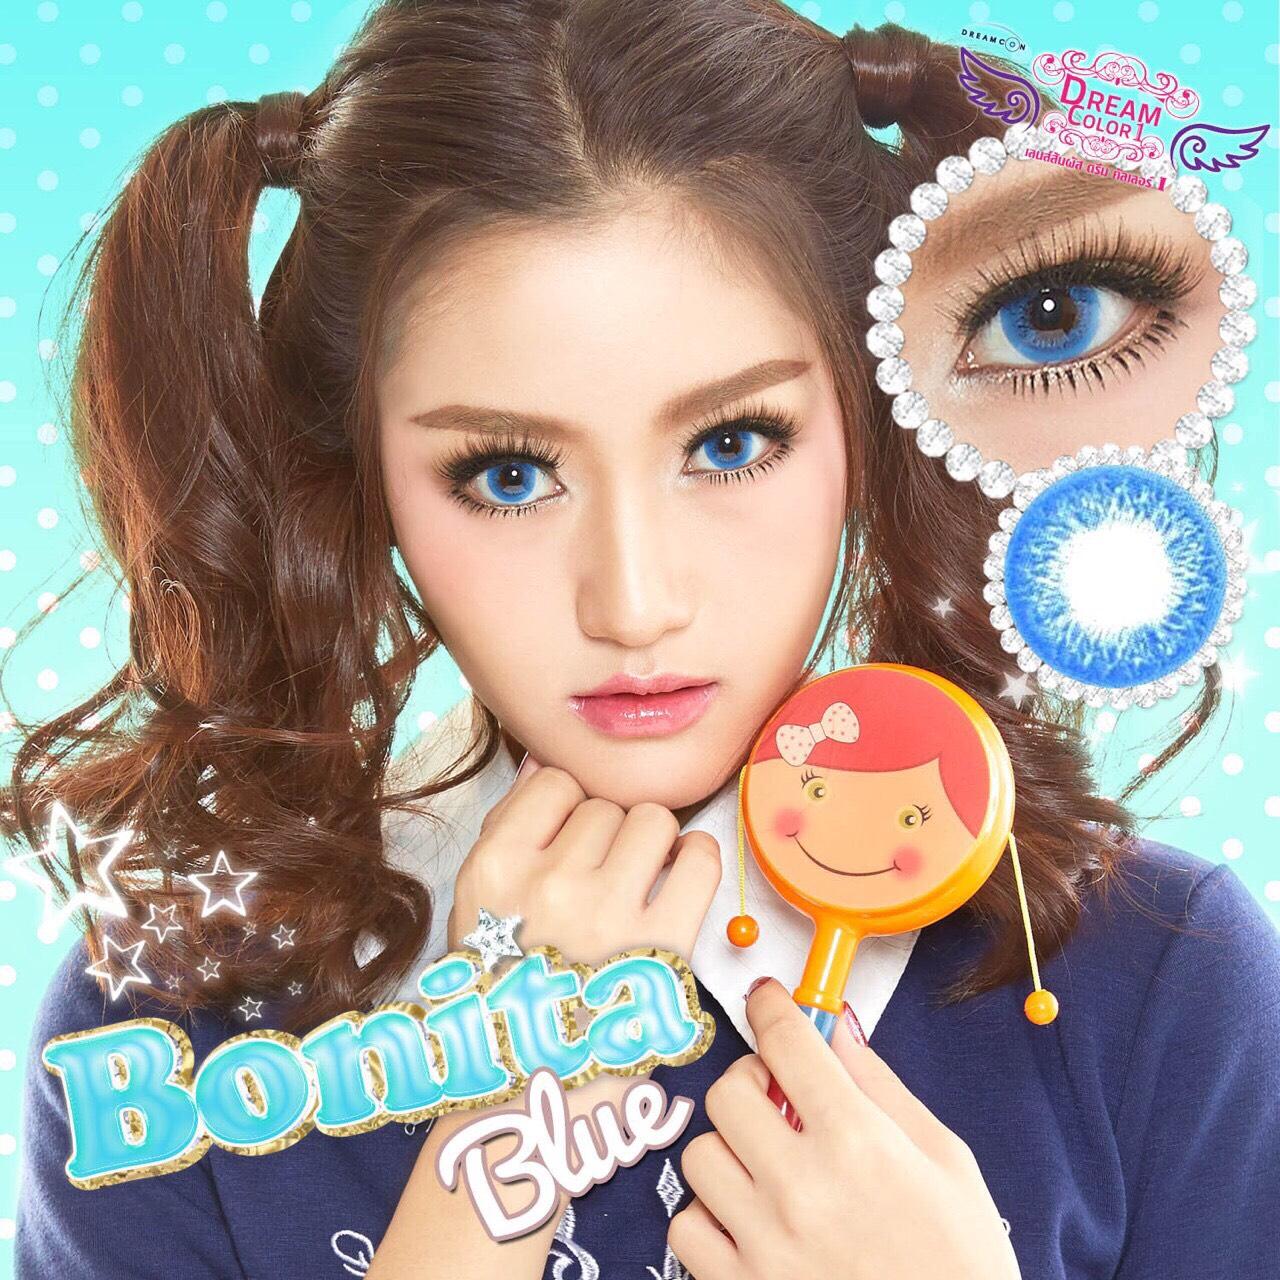 Bonita Blue Dreamcolor1เลนส์นิ่มใส่สบาย คอนแทคเลนส์ ขายส่งคอนแทคเลนส์ ขายส่งBigeye Bigeyeเกาหลี